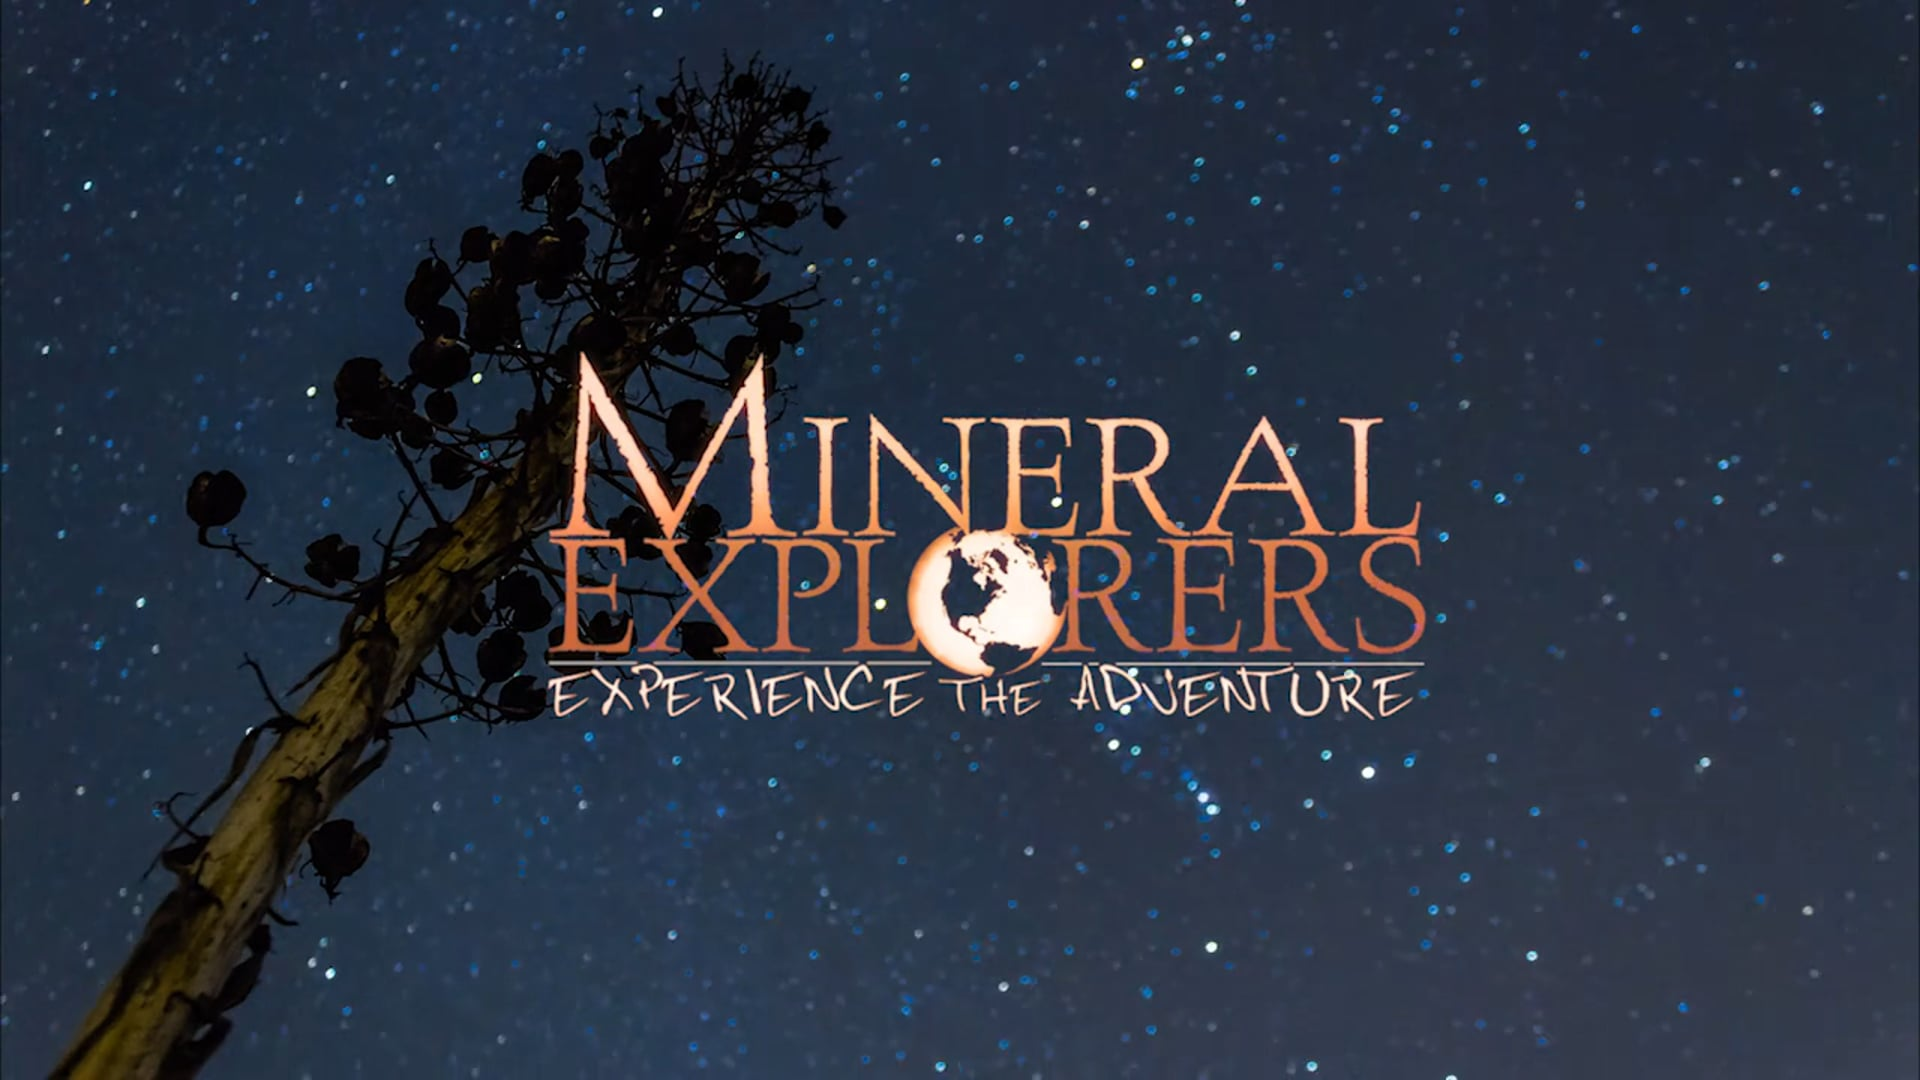 MINERAL EXPORERS: SEASON 2 PROMO